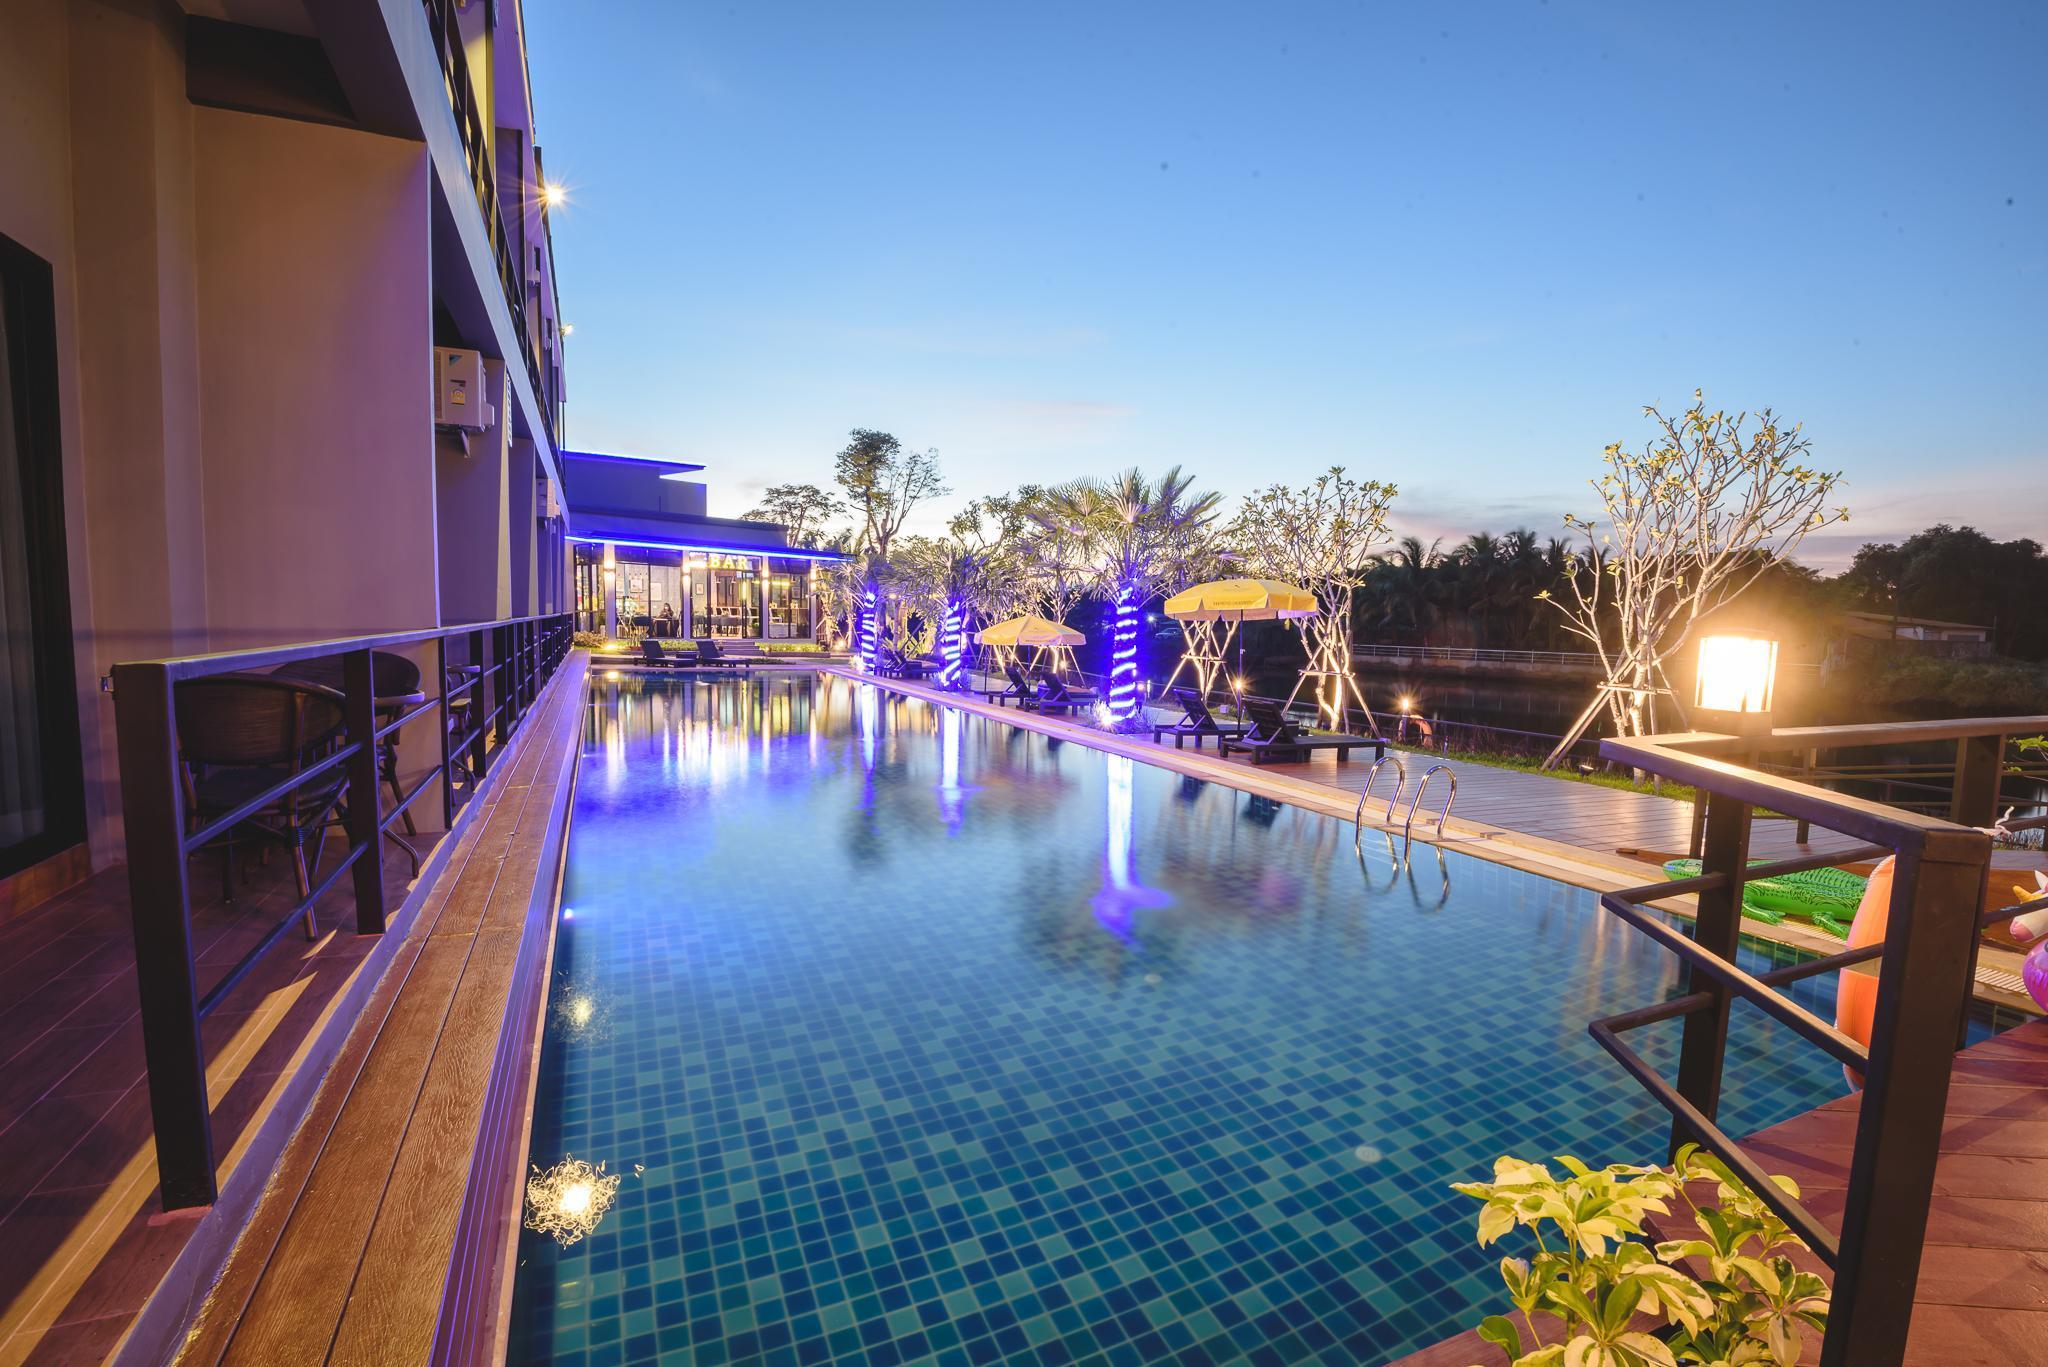 Phuengluang Riverside Hotel